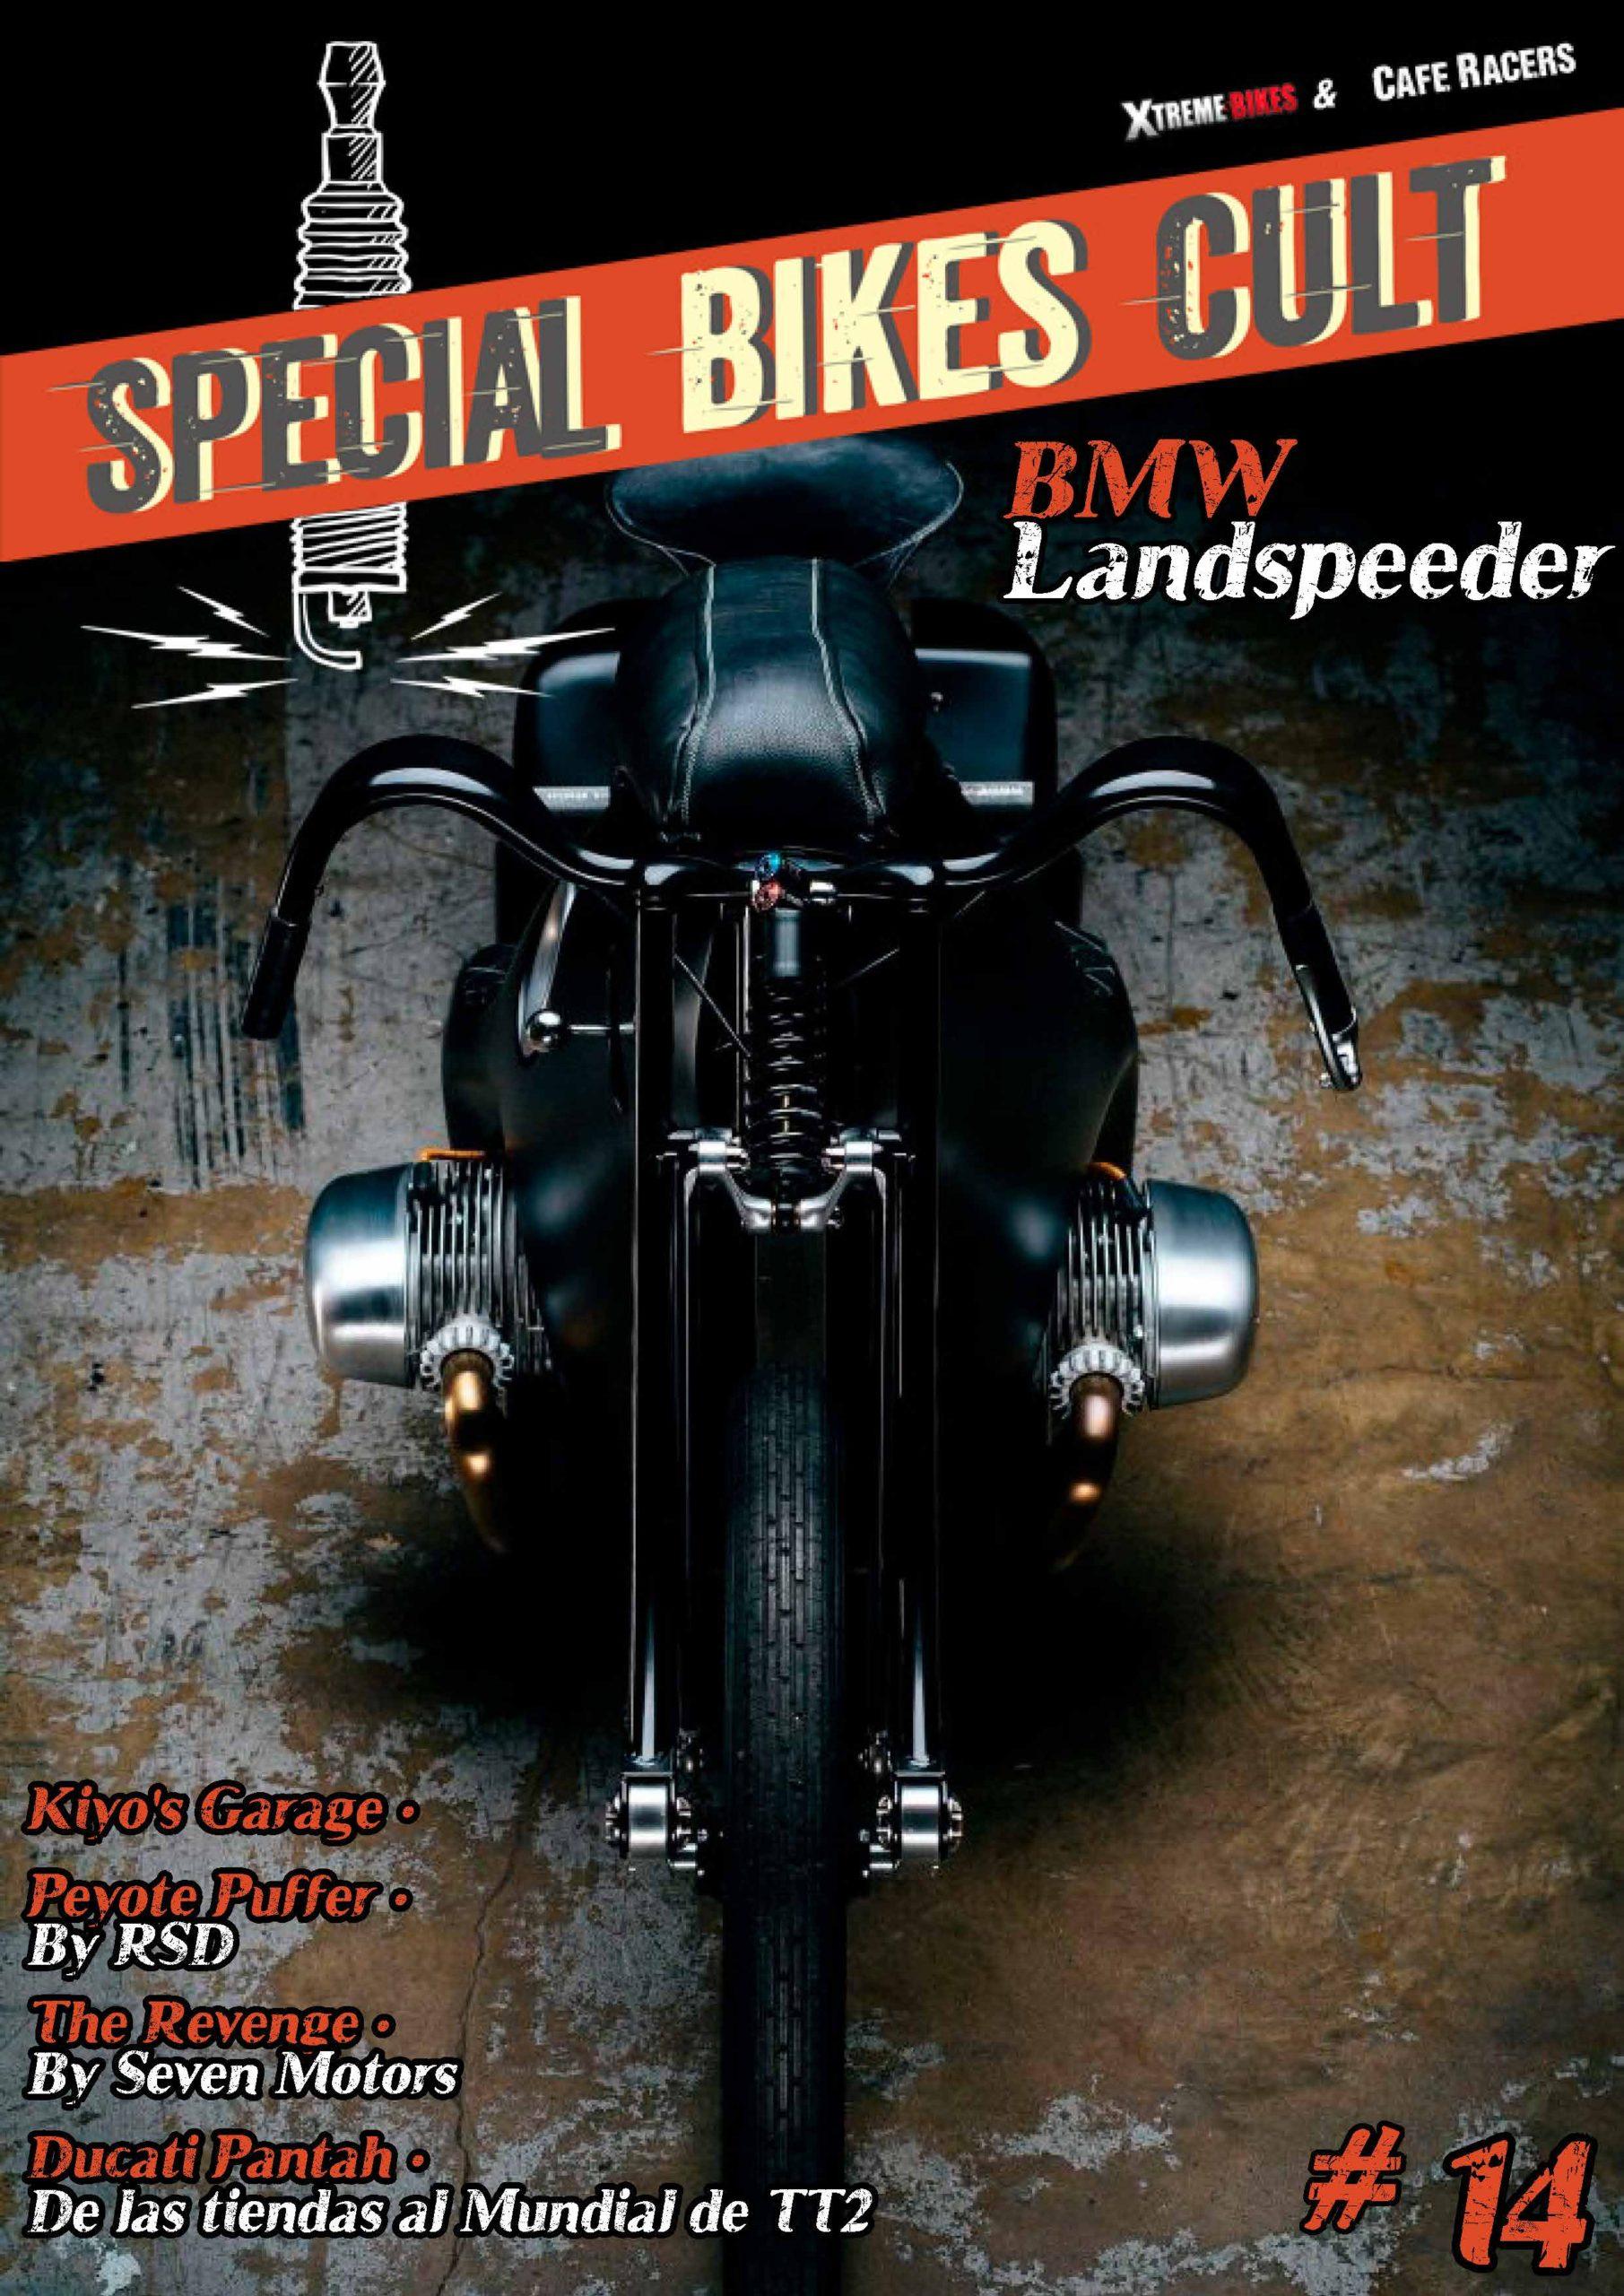 Special Bikes Cult #14